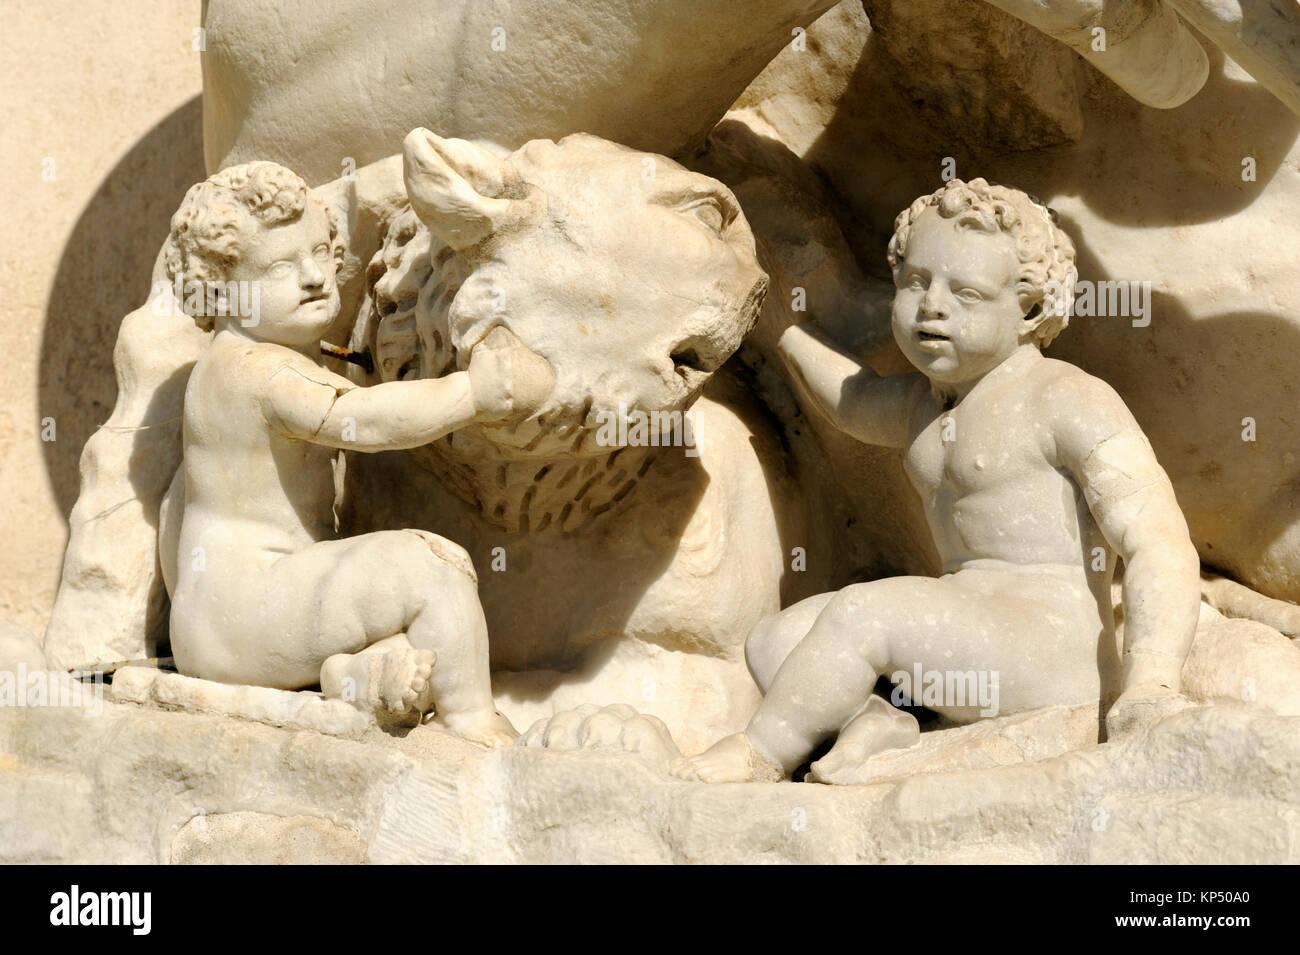 italy, rome, campidoglio, roman statue of the tiber river, romulus and remus - Stock Image